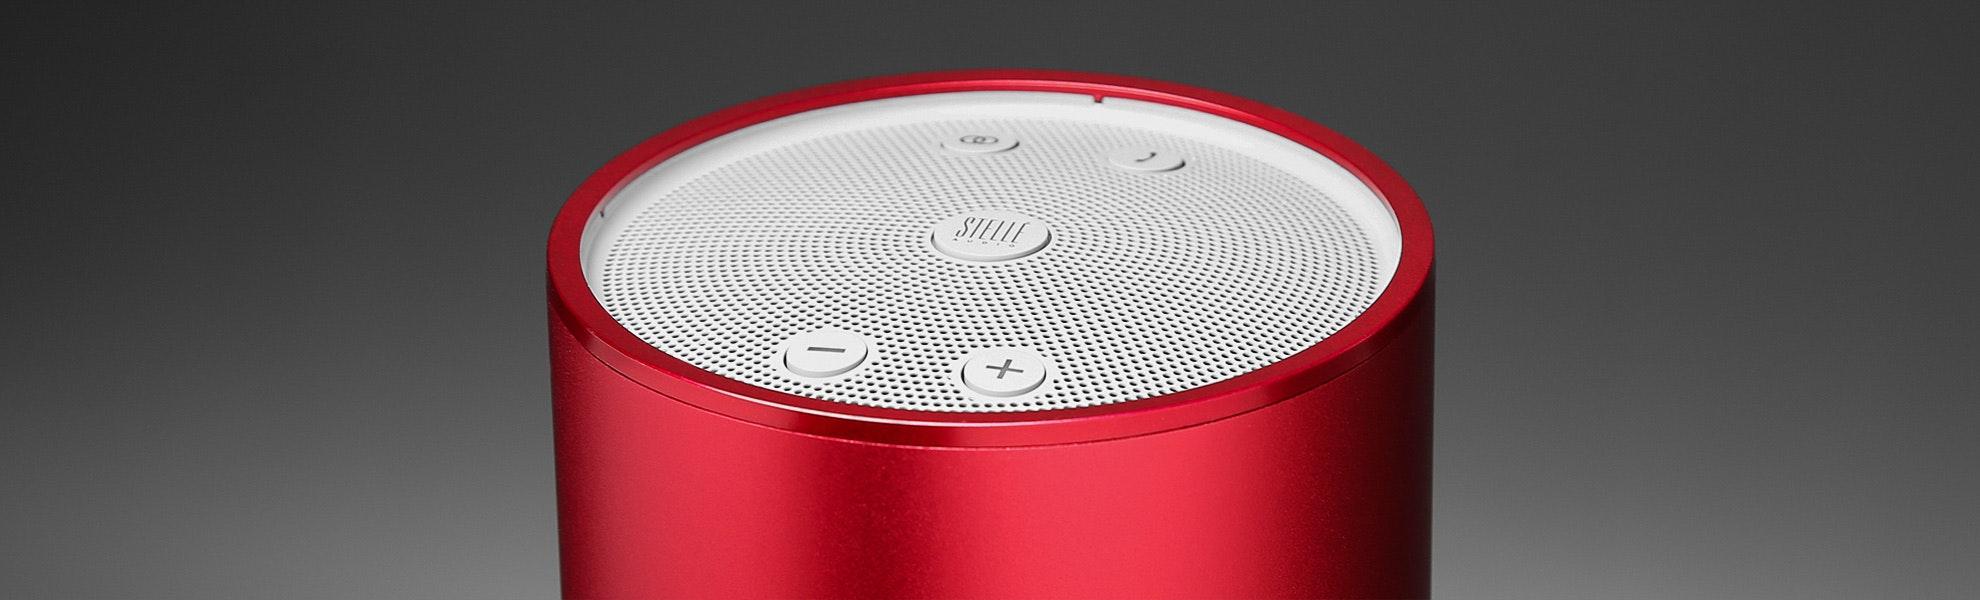 Stellé Audio Pillar Bluetooth Speaker